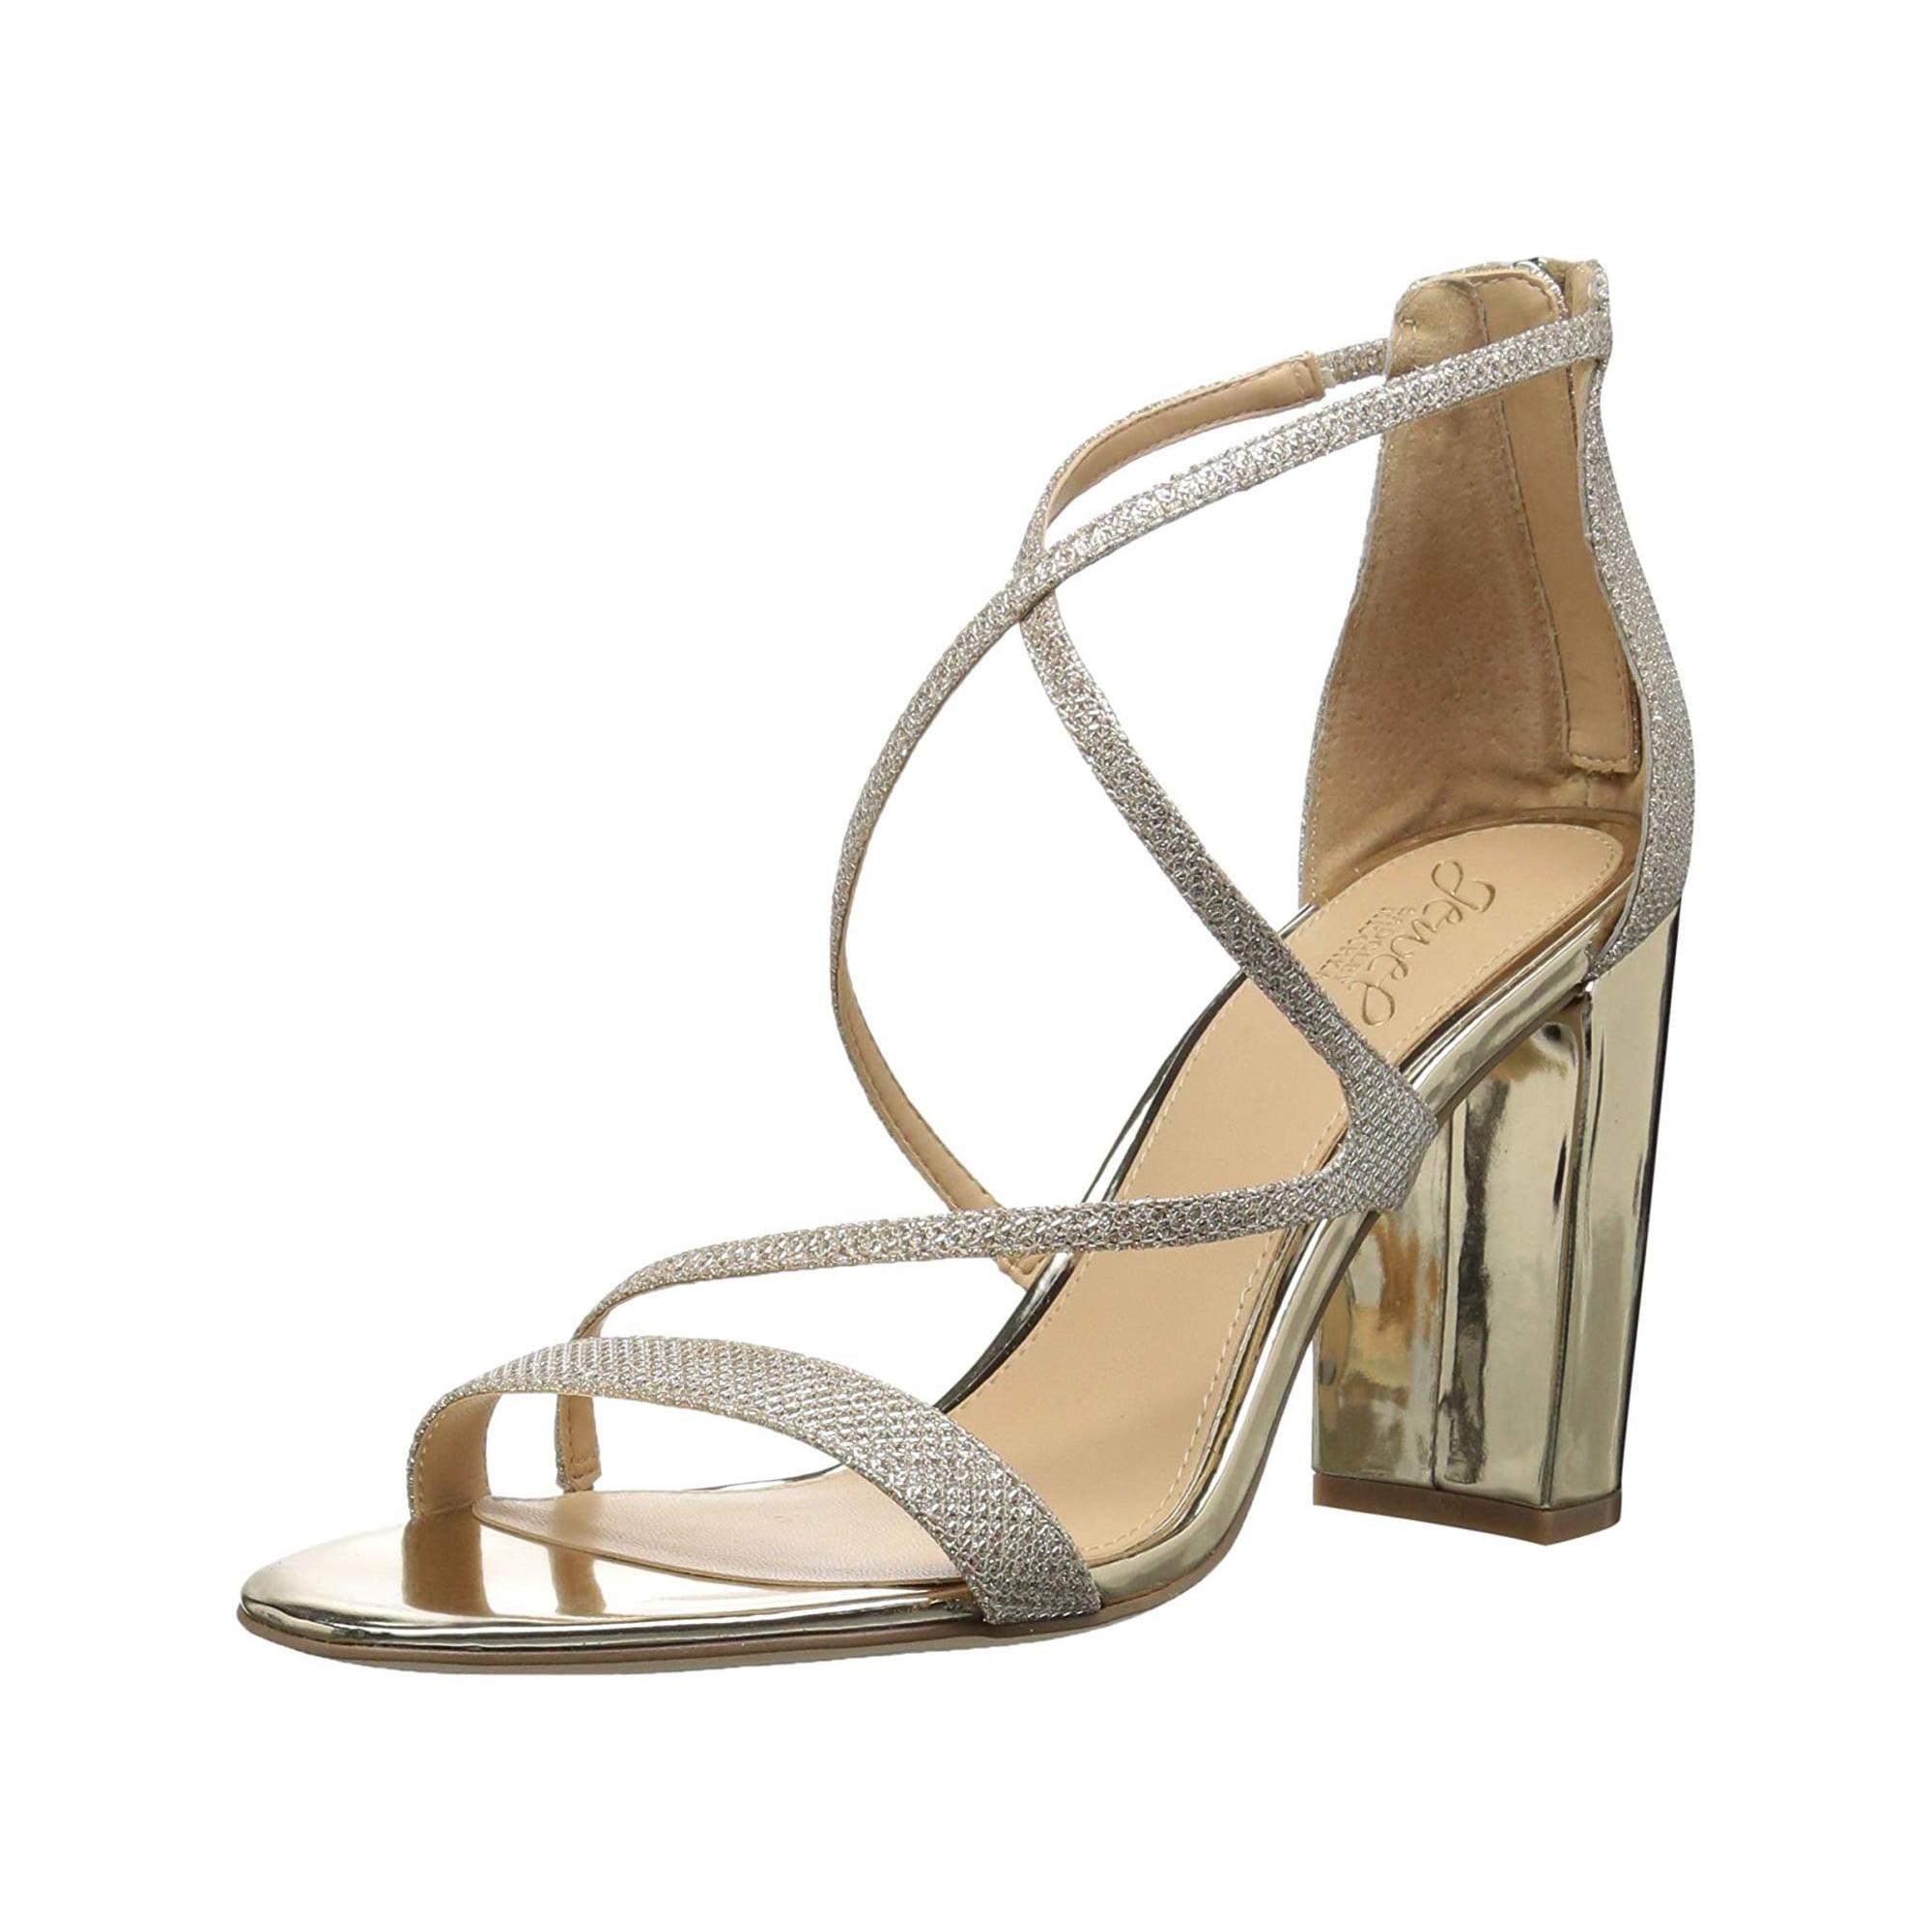 27bd2e716fe Badgley Mischka Jewel Women s Gale Heeled Sandal